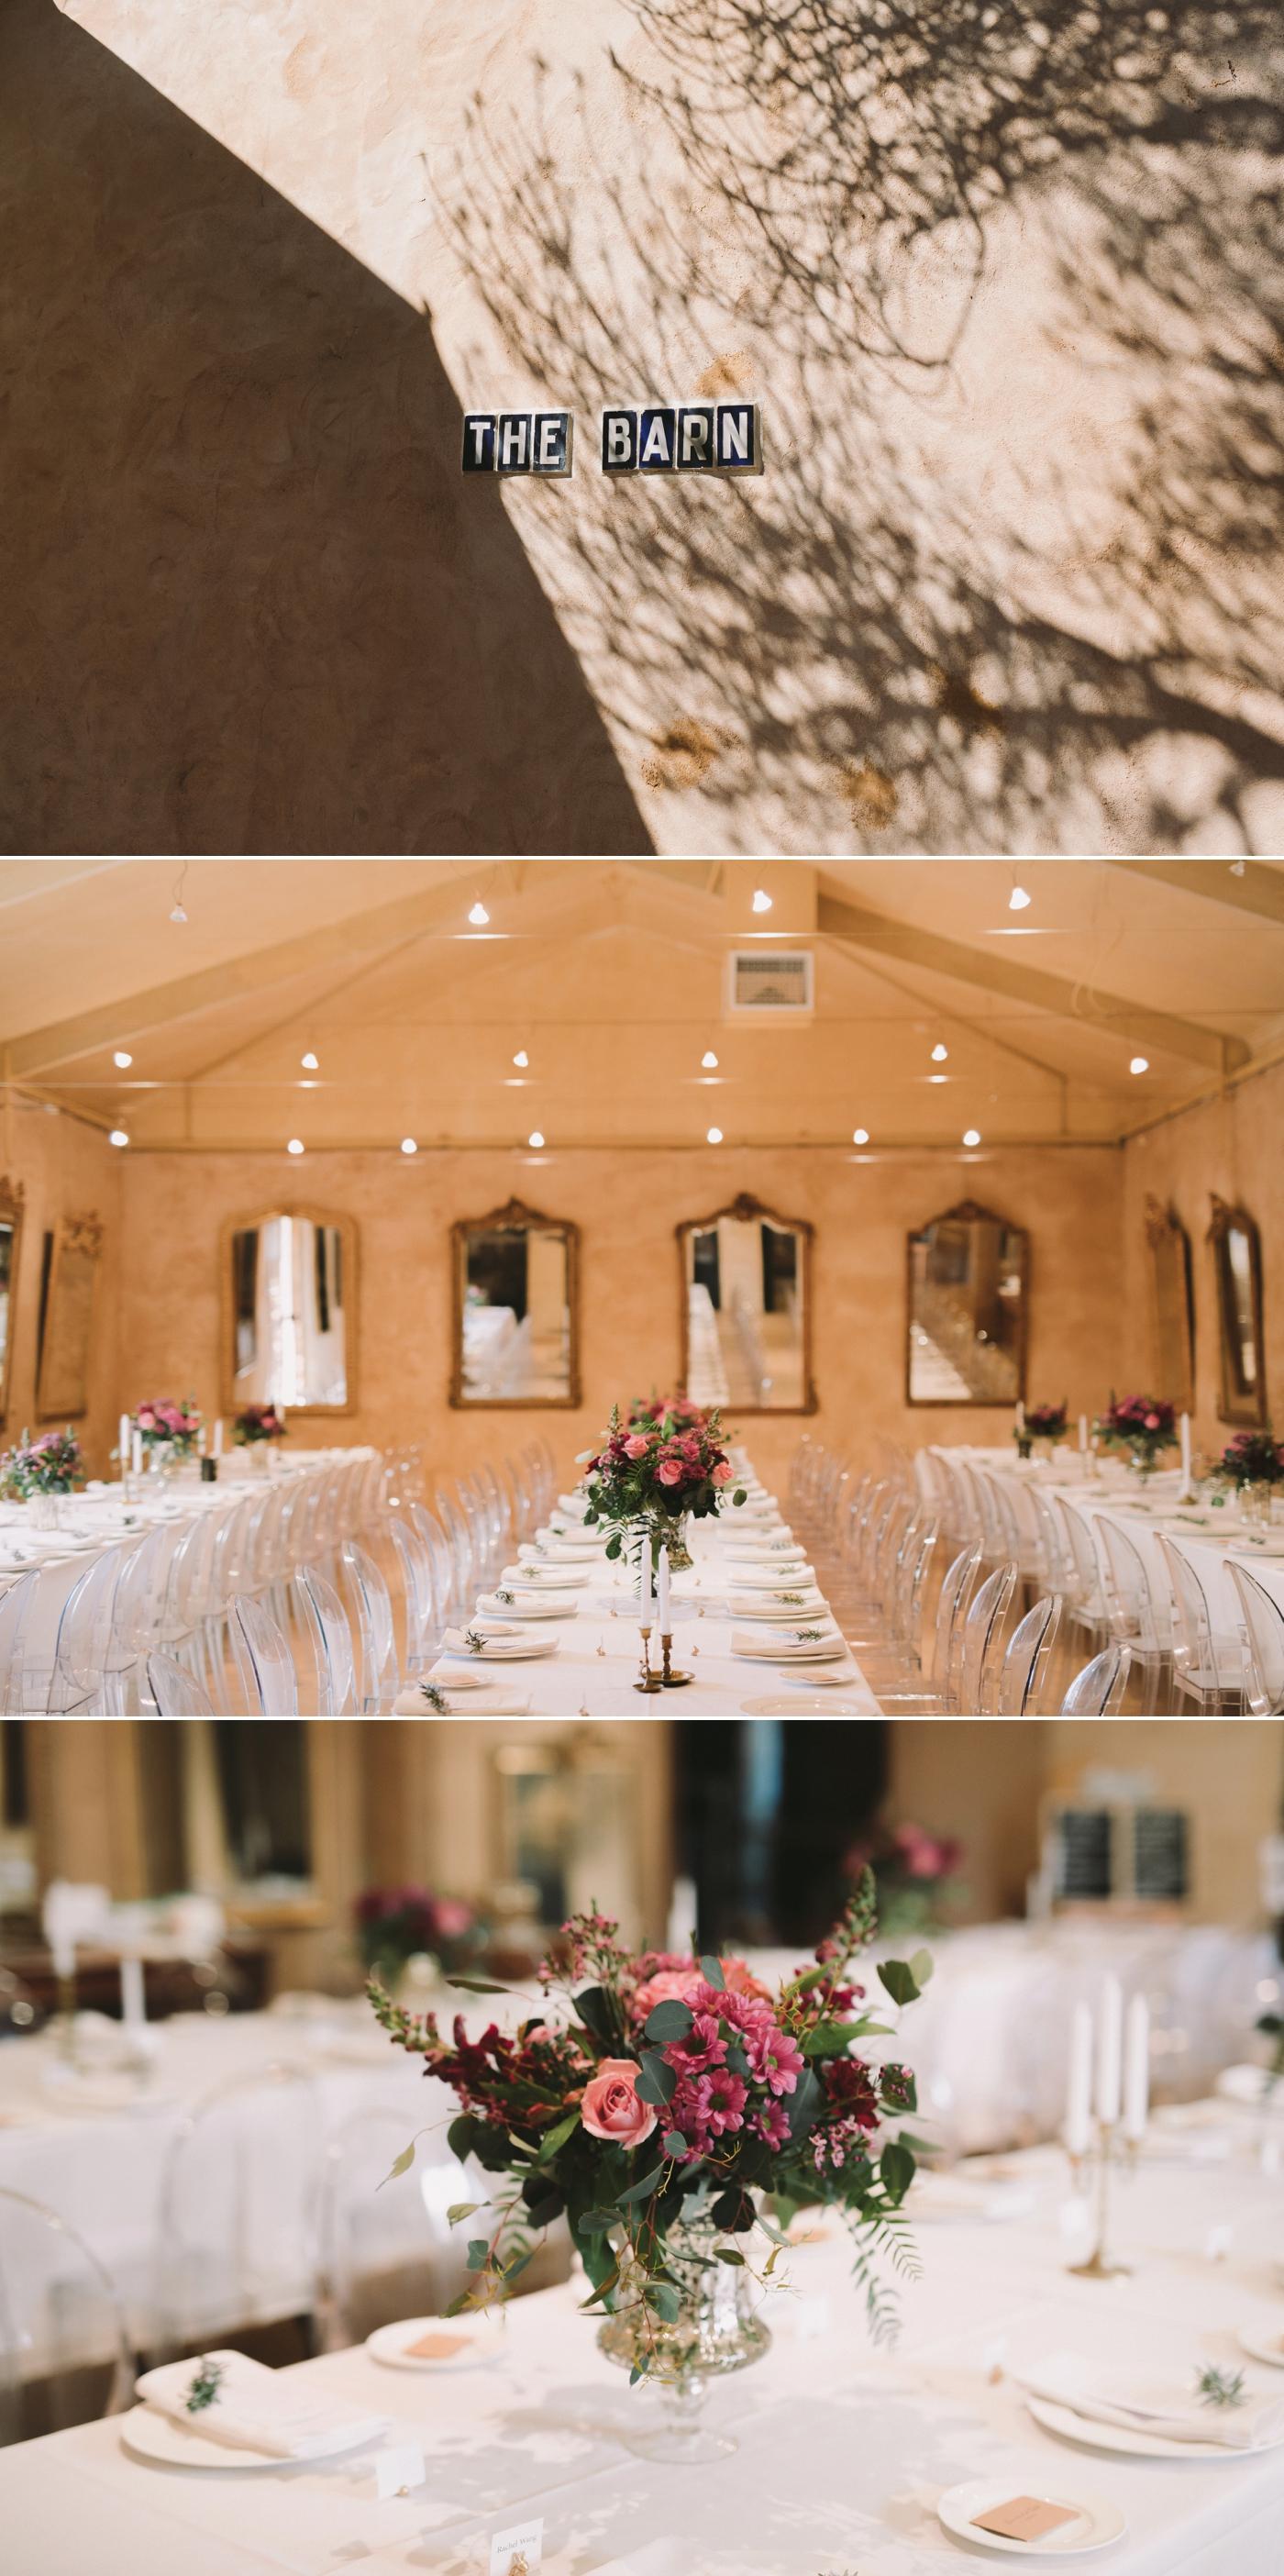 Adelaide Wedding Photographer - Al Ru Farm Wedding in Adelaide - Natural Wedding Photography Australia - www.katherineschultzphotography.com - Todd & Rachel_0009.jpg